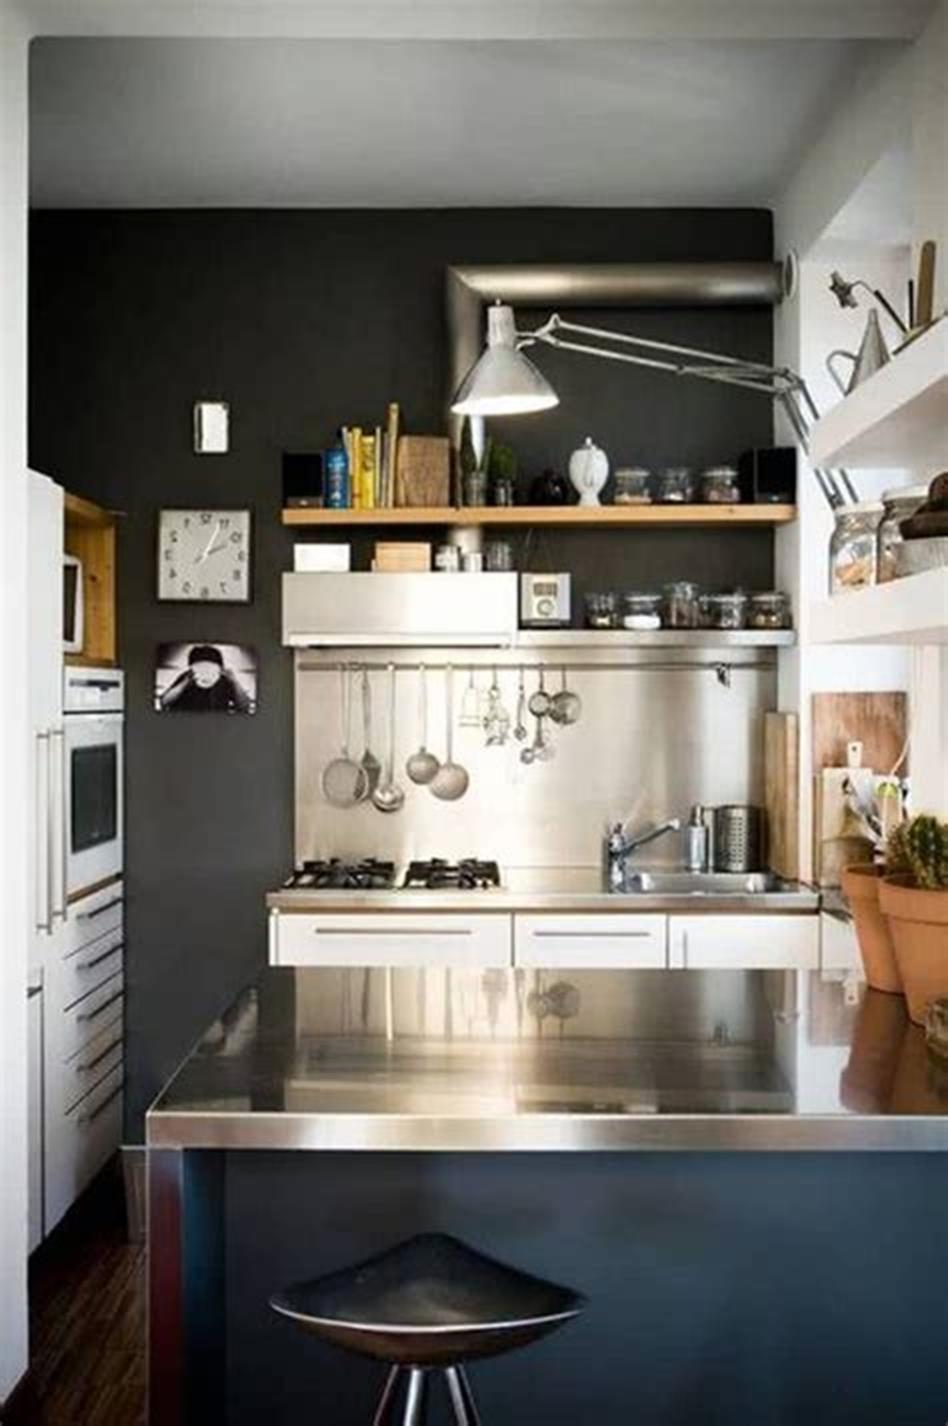 50 amazing modern kitchen design ideas for small spaces on awesome modern kitchen design ideas id=58902